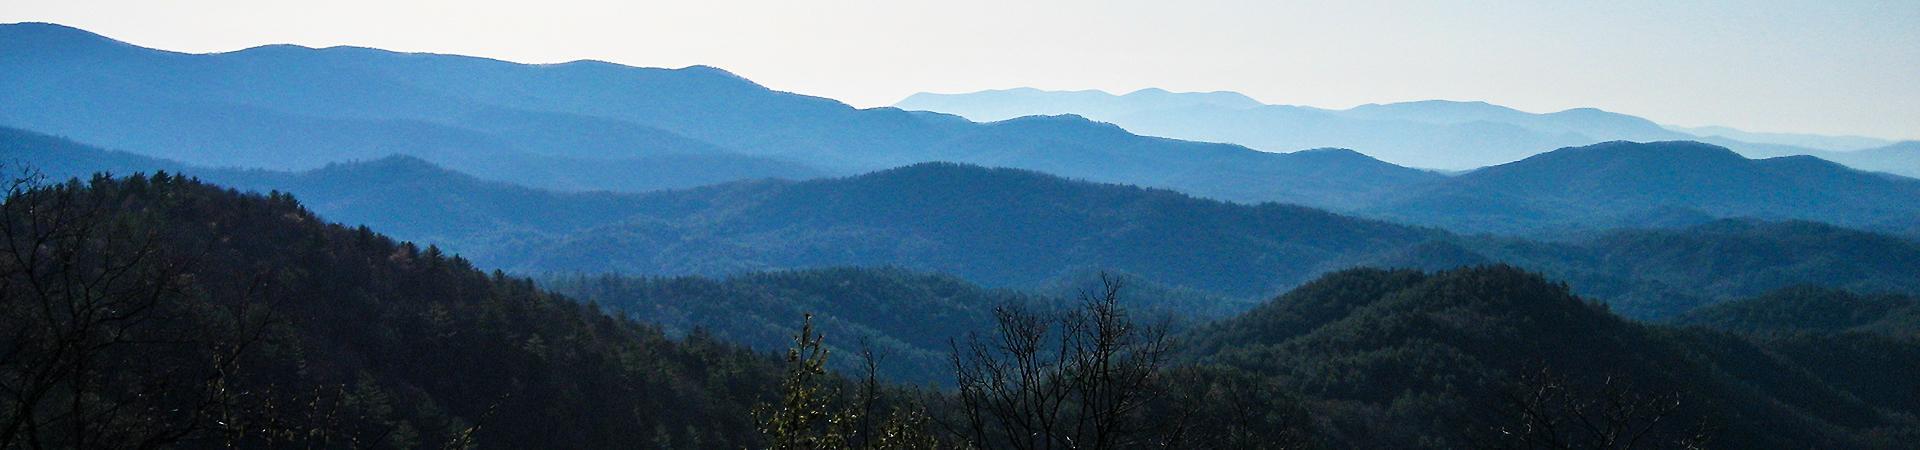 mountain range at Cohutta WMA